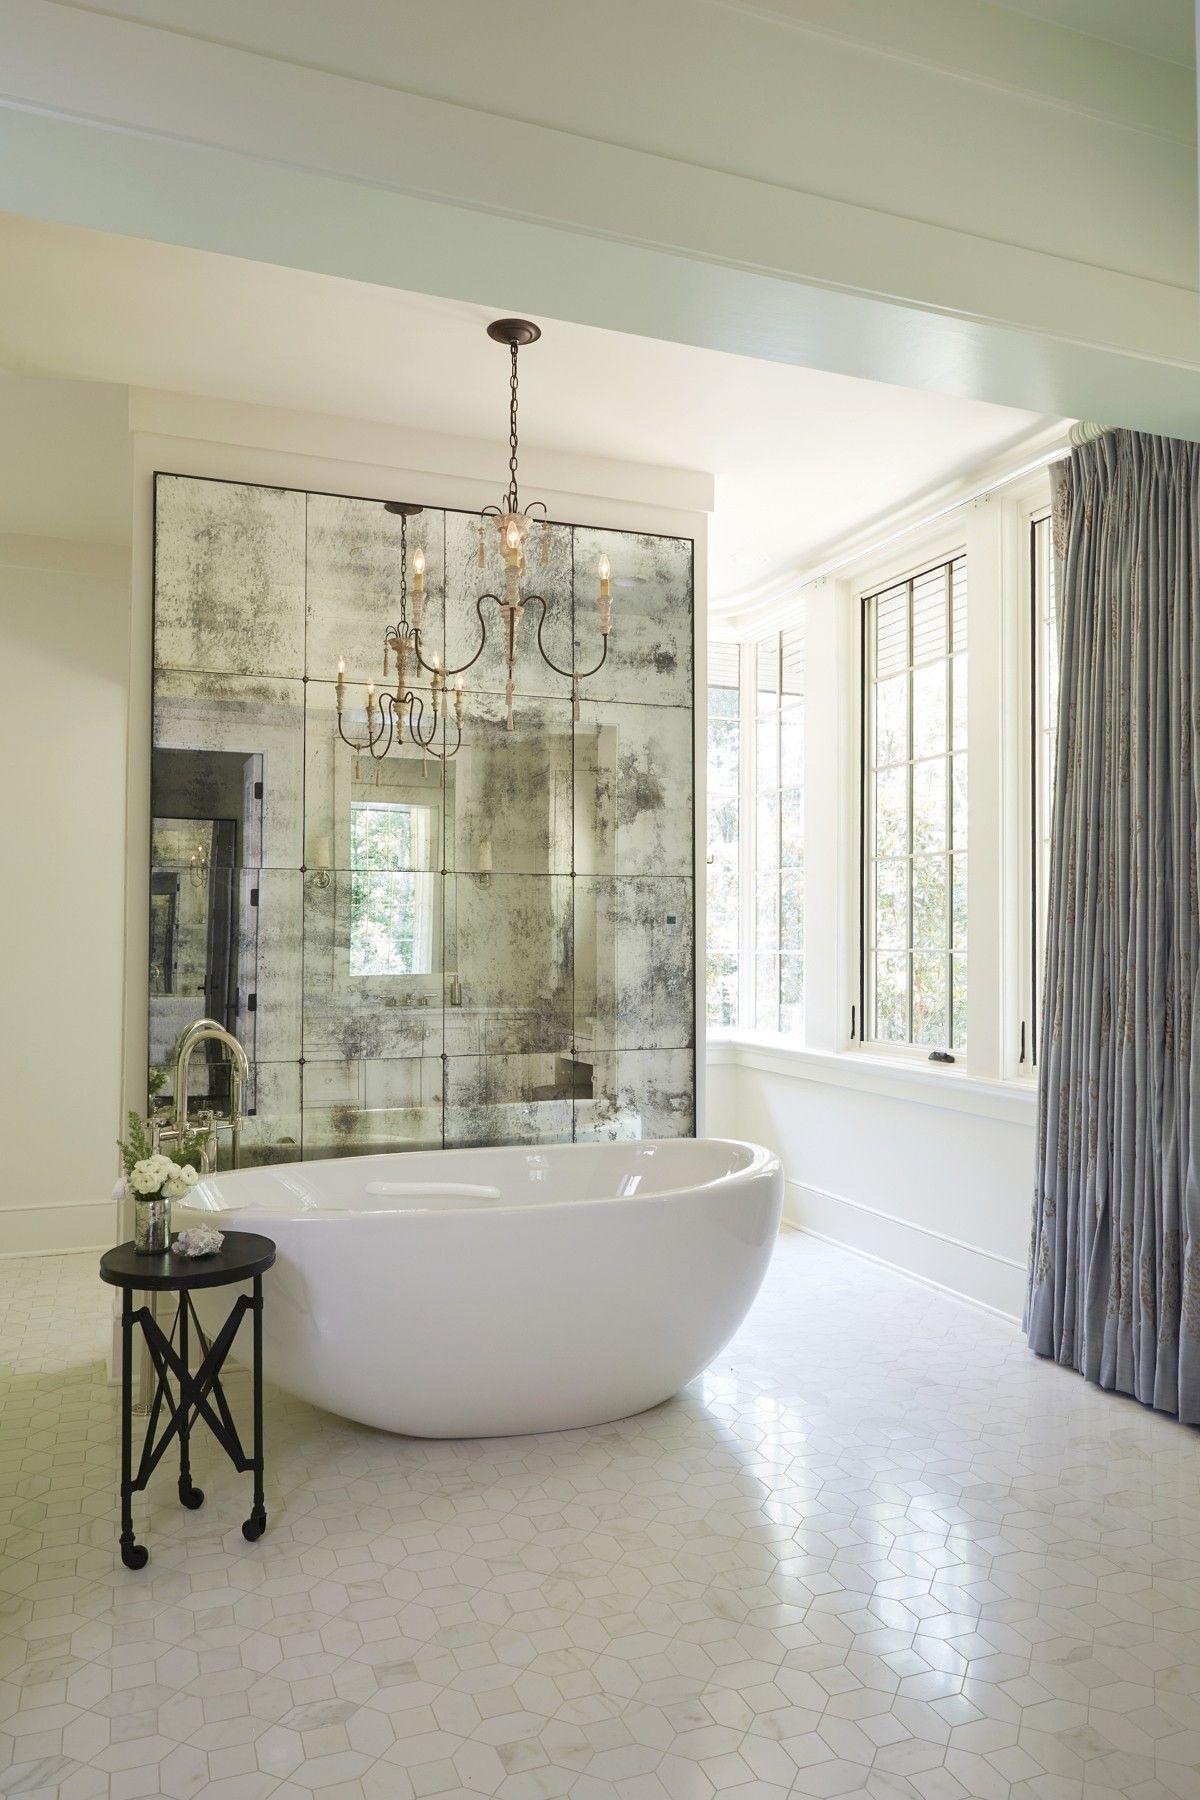 Interior Designer Crush: Joanna Goodman | Drapery panels, Tile ...